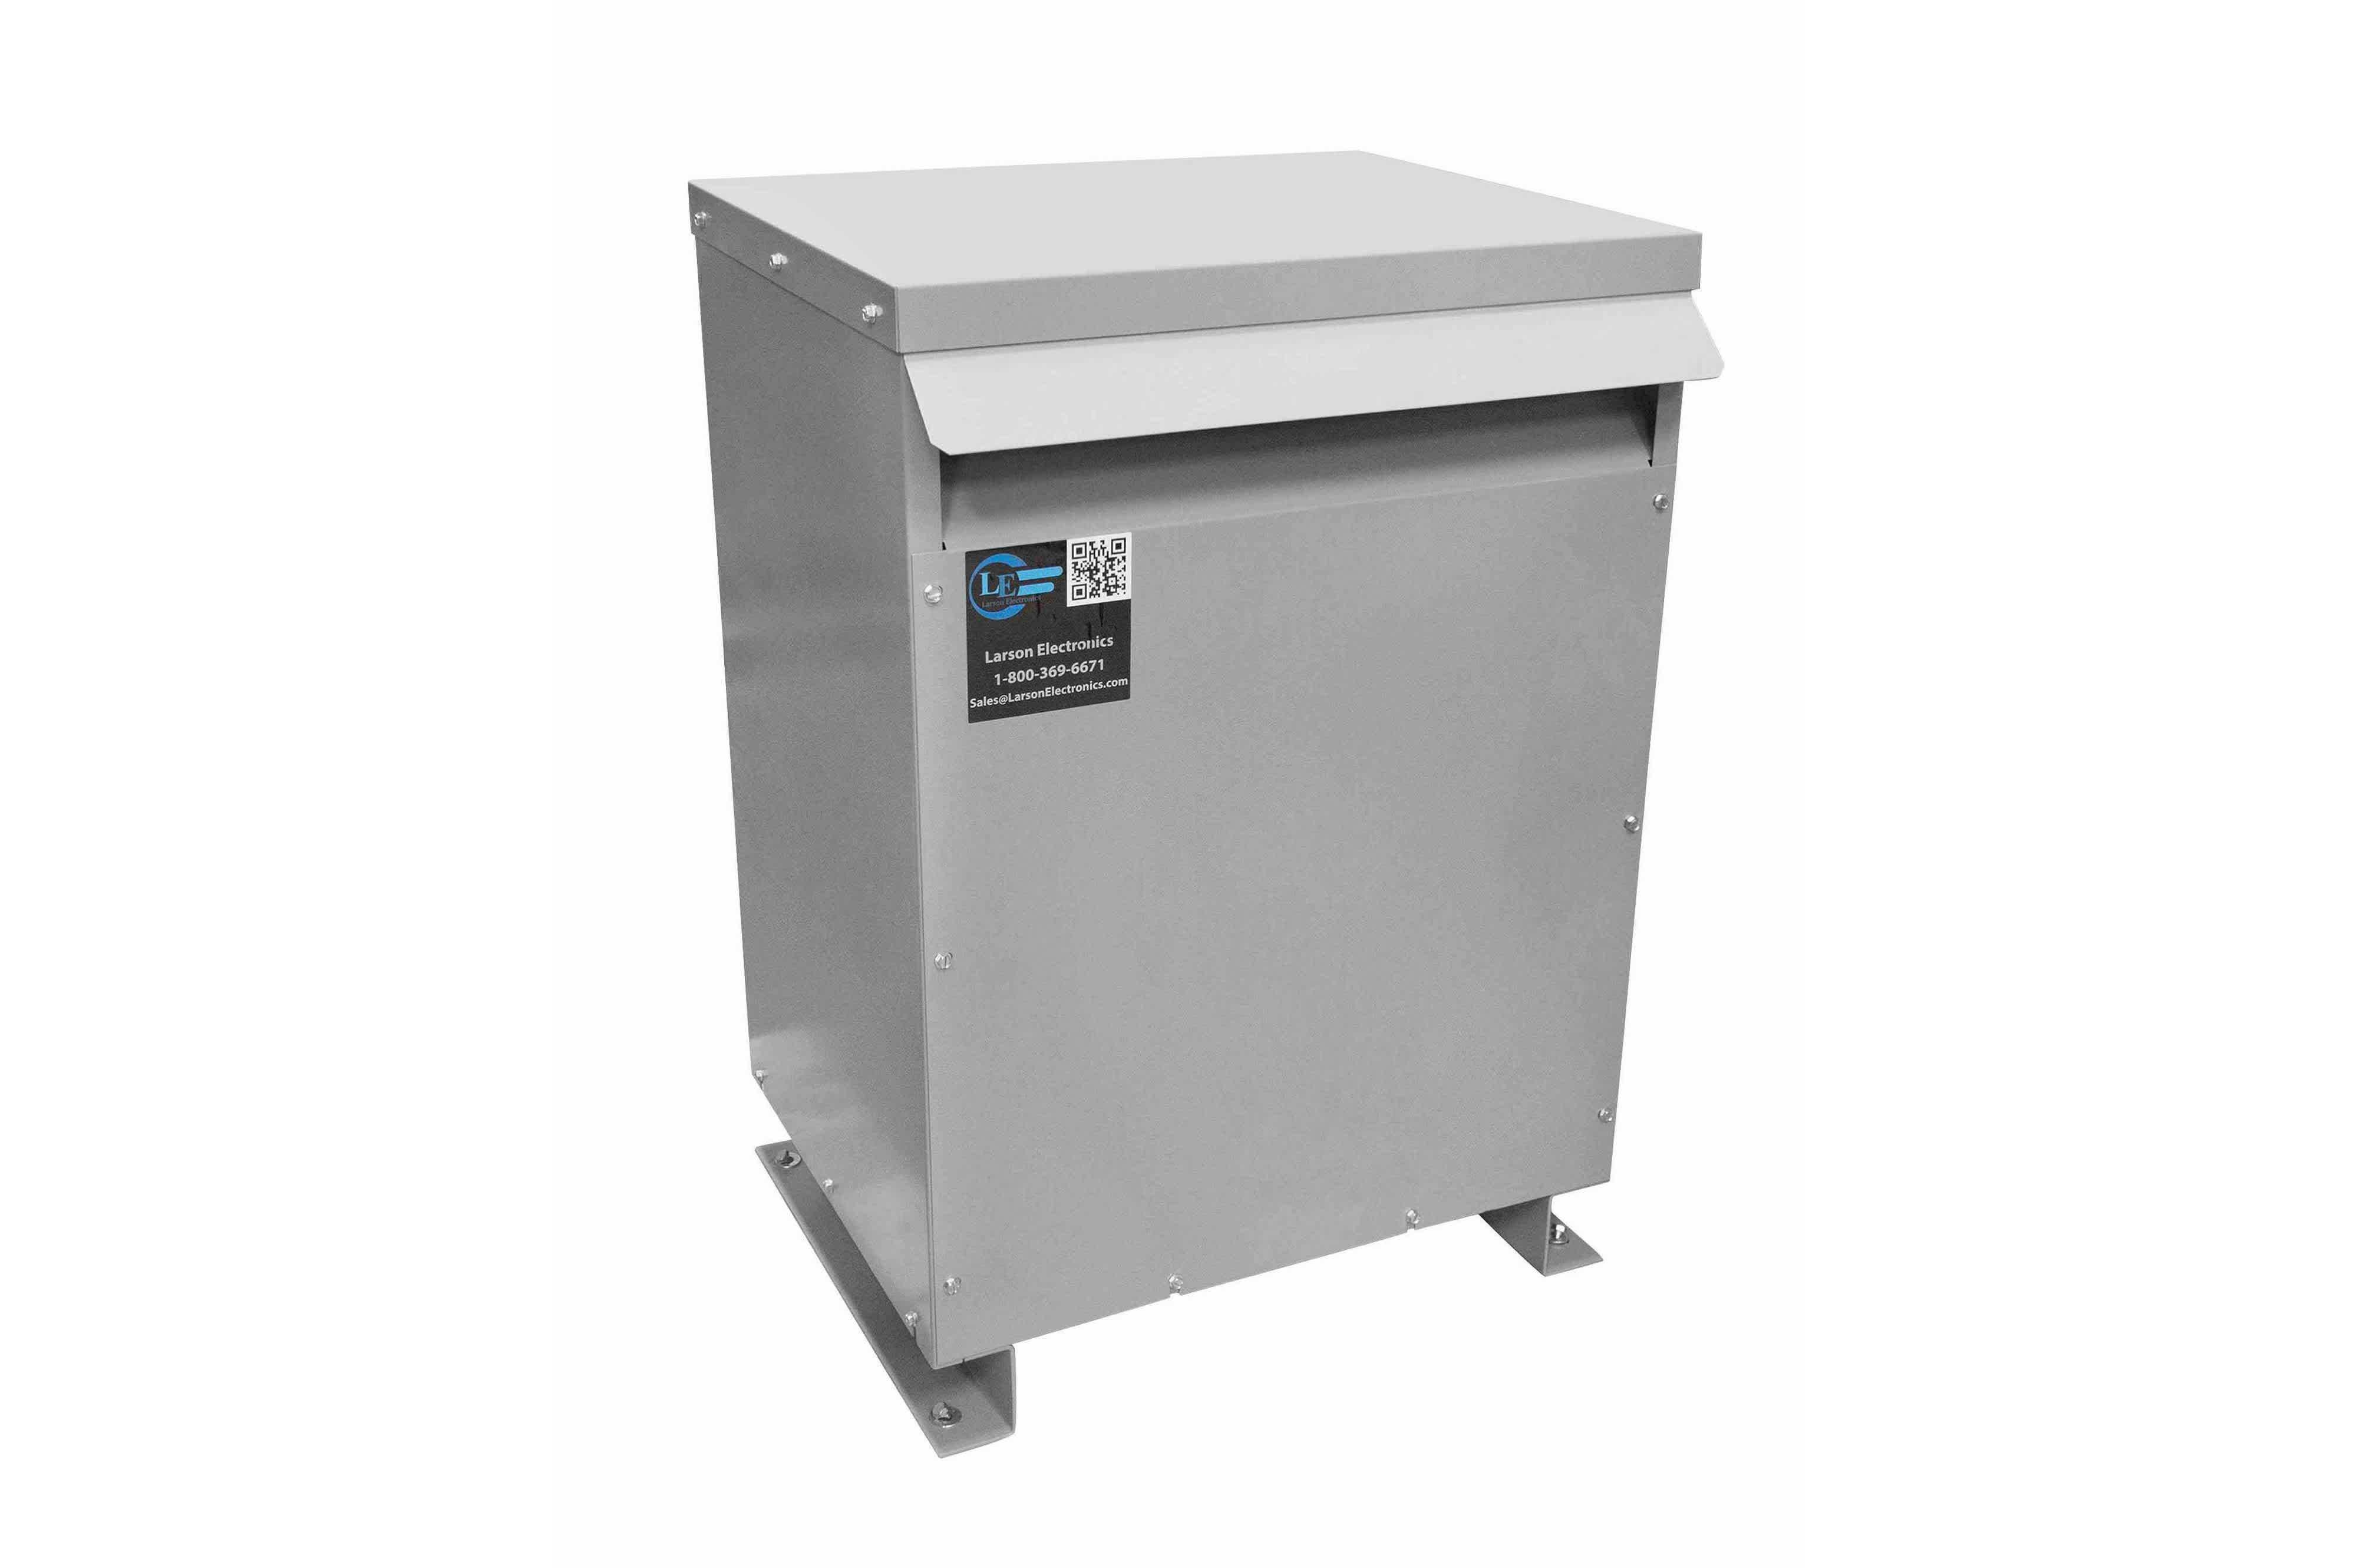 18 kVA 3PH Isolation Transformer, 600V Wye Primary, 380V Delta Secondary, N3R, Ventilated, 60 Hz